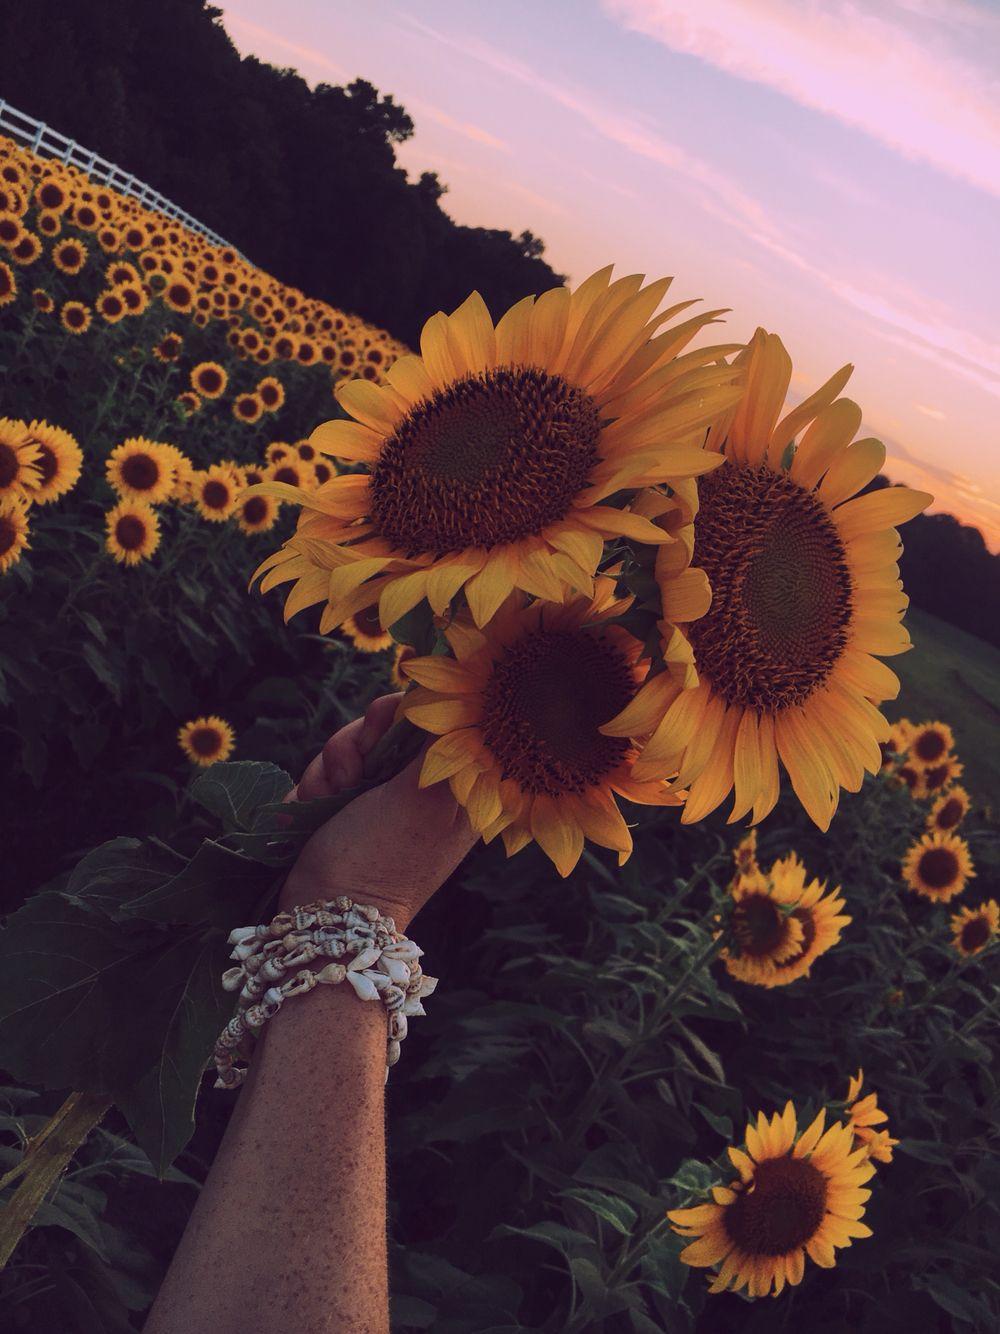 Bouquet Of Sunshine Flower Aesthetic Sunflower Pictures Sunflower Flower